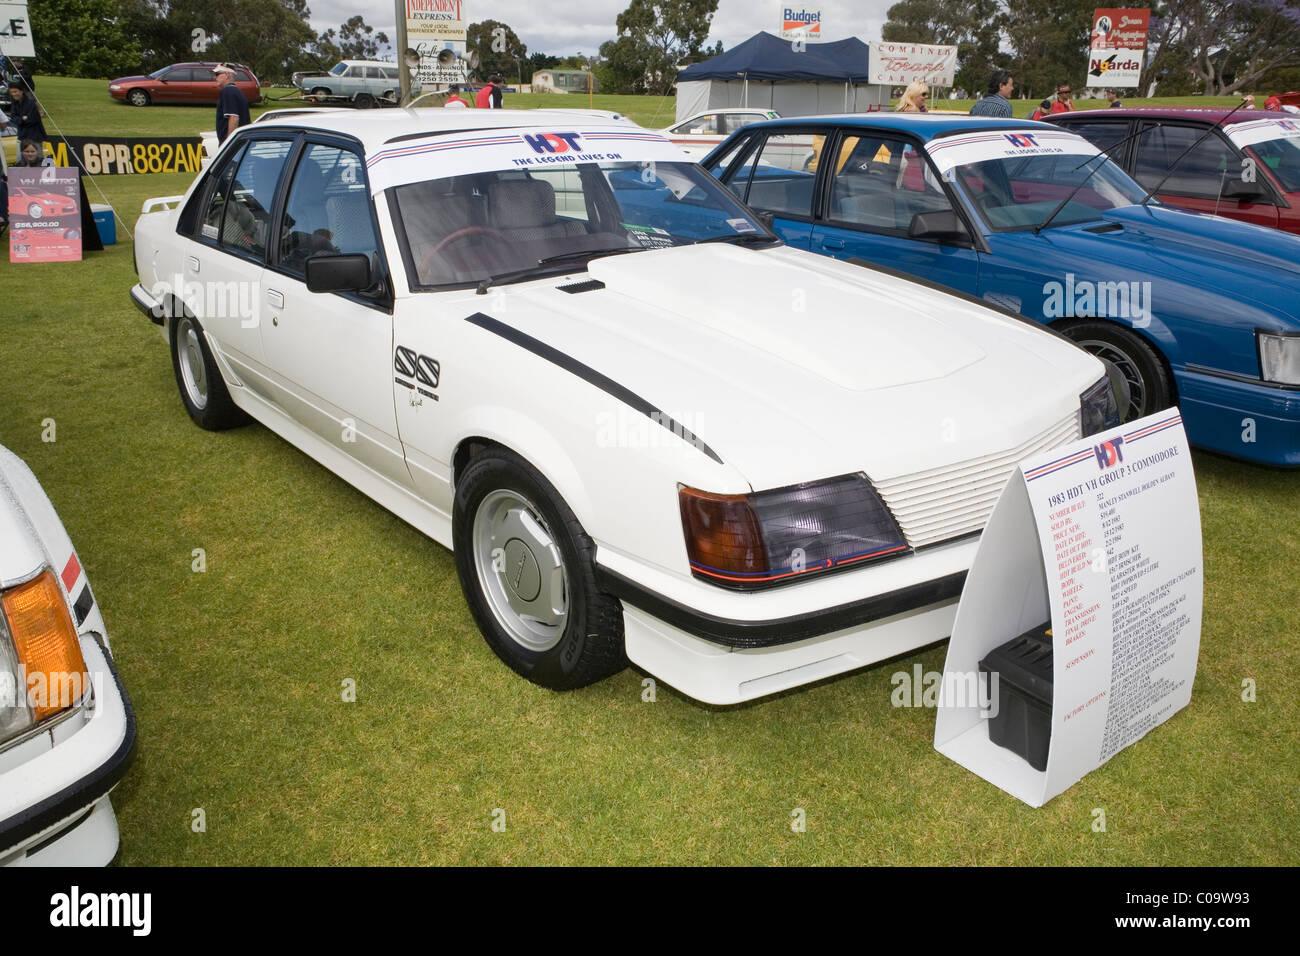 80s Sports Car Stock Photos & 80s Sports Car Stock Images - Alamy